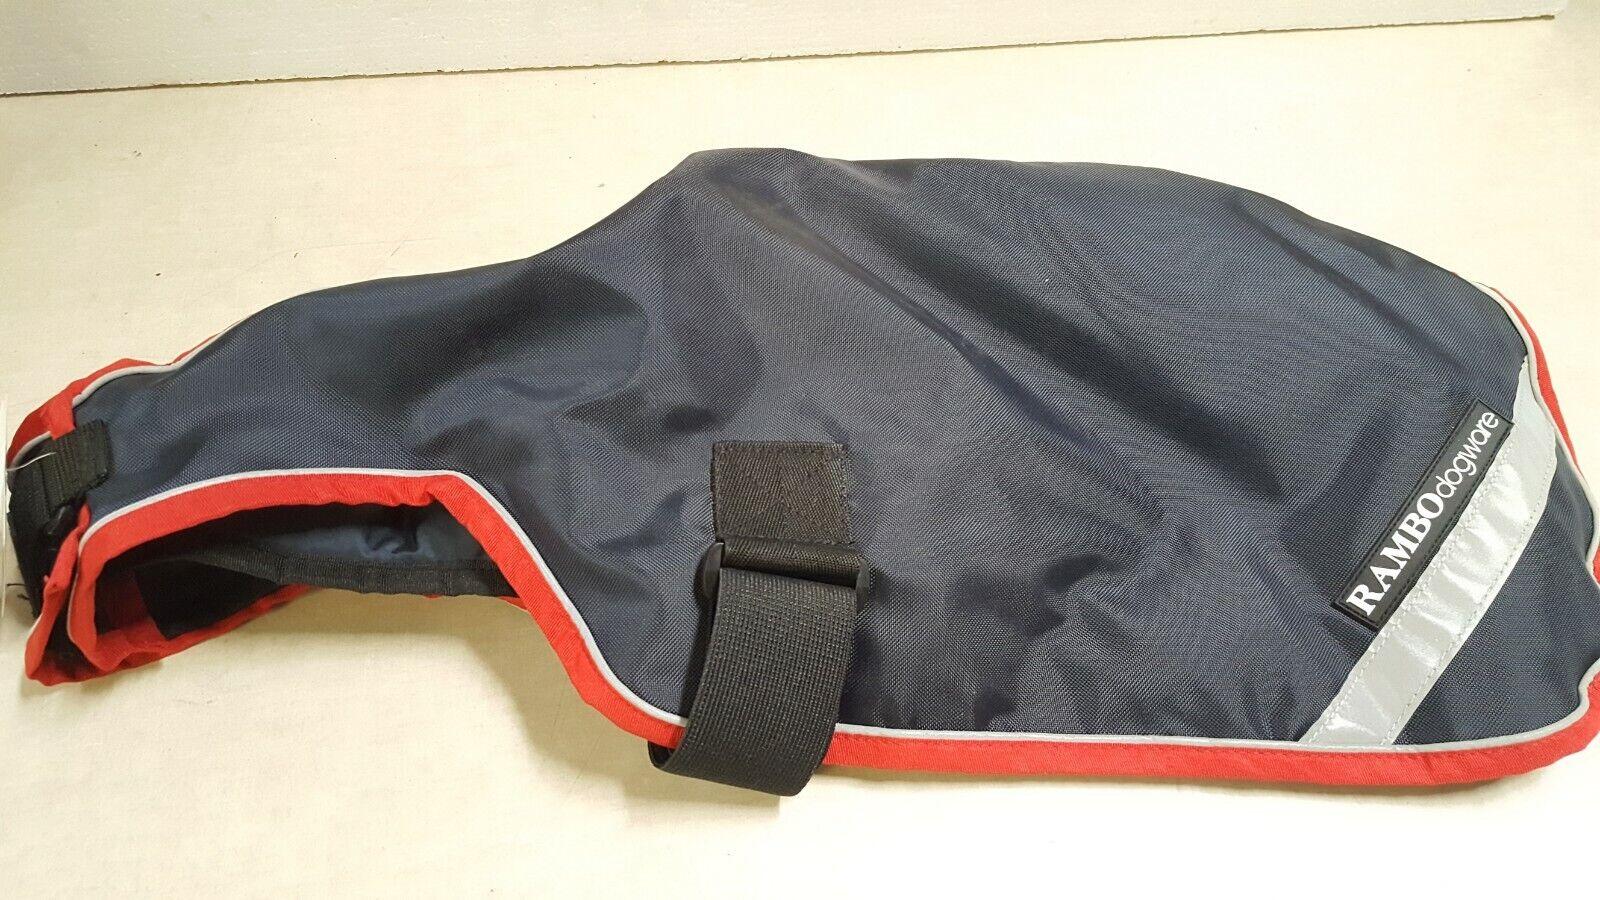 Rambo Waterproof Dog Blanket 100g - Navy blueee Red - Medium